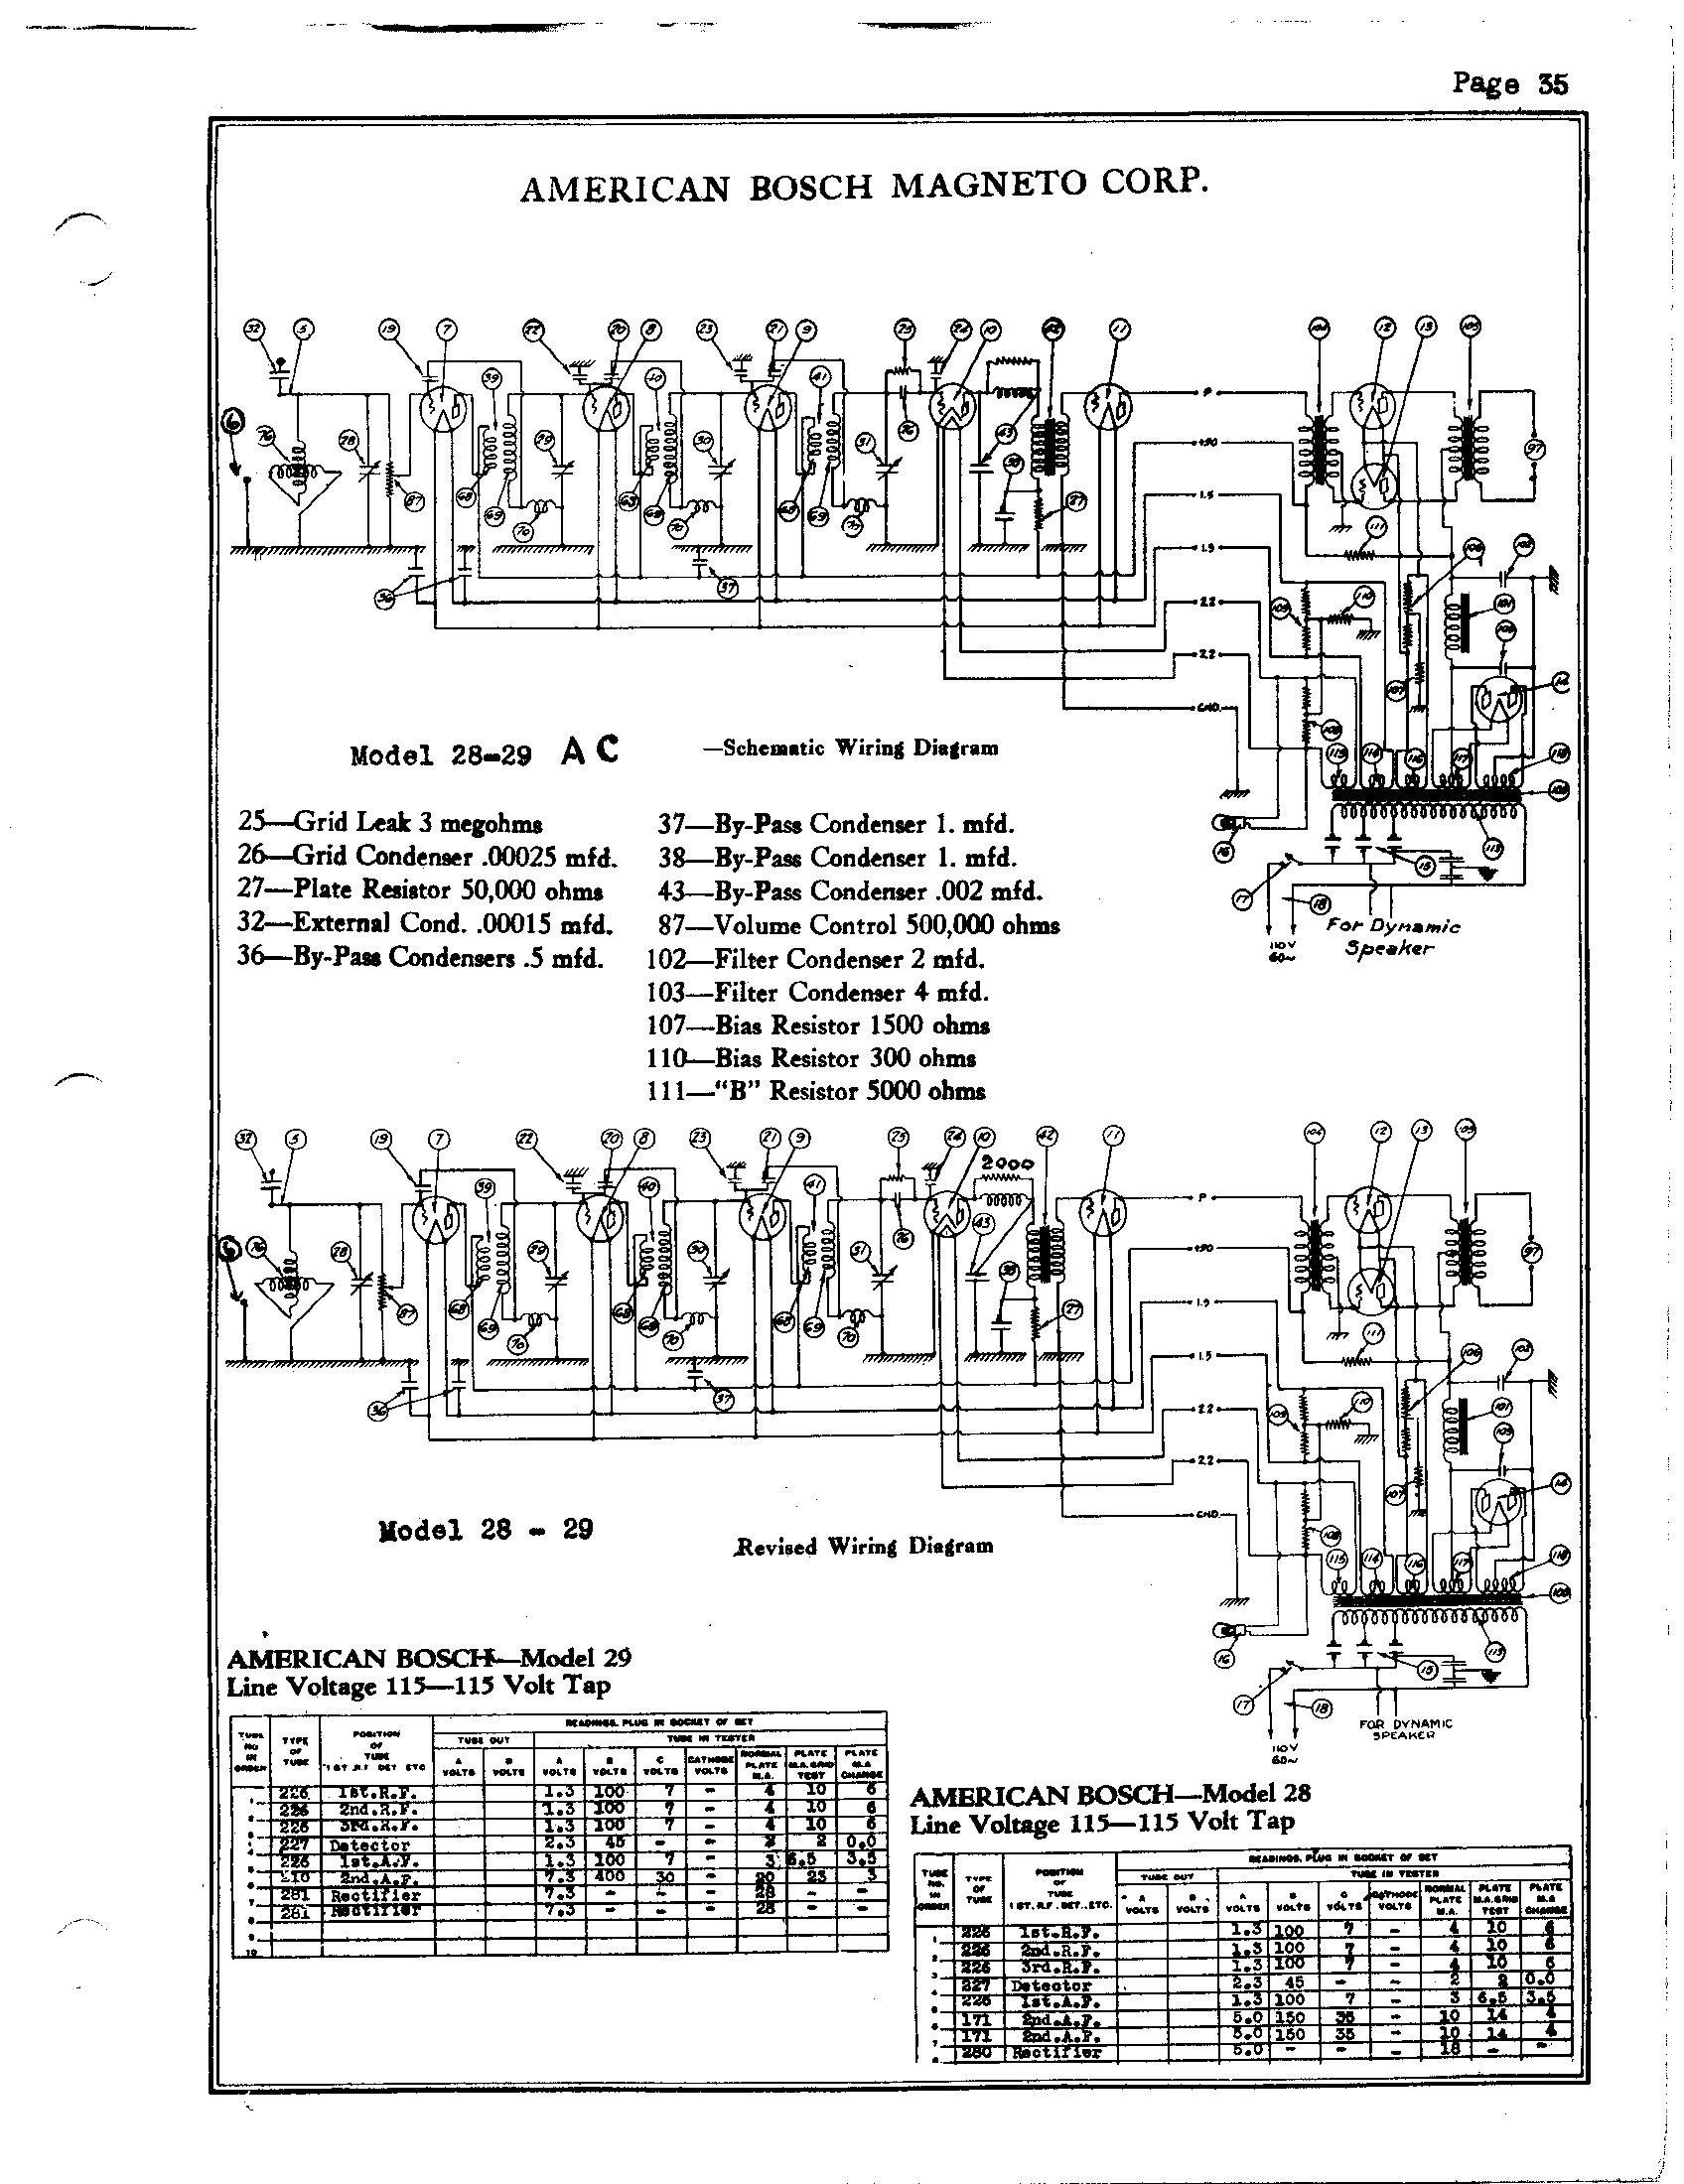 American Bosch 29